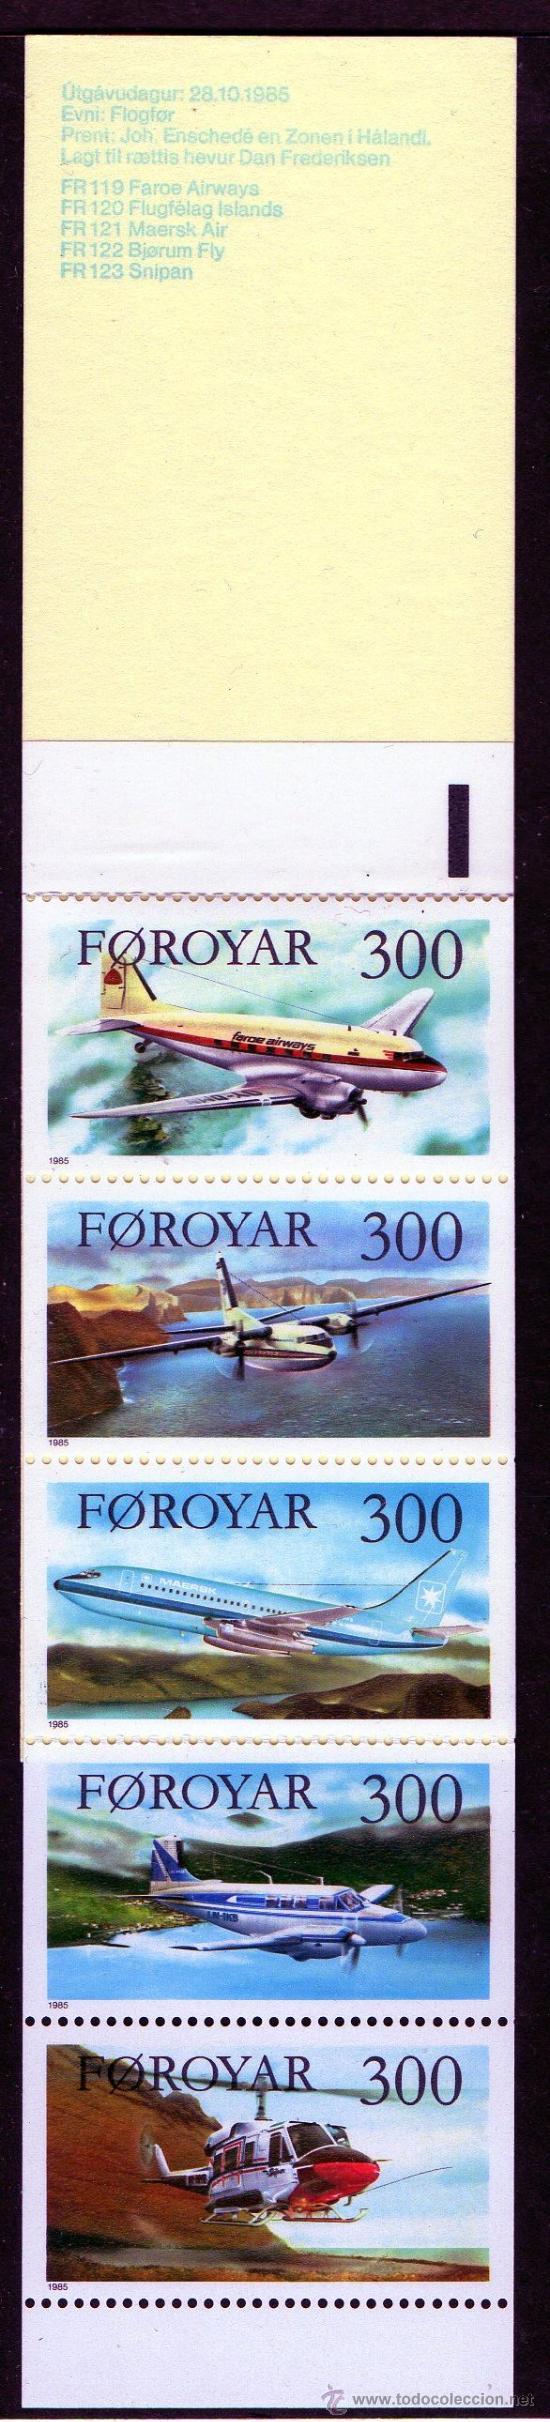 FEROE AÑO 1985 YV C 119*** CARNET - AVIONES - TRANSPORTES (Sellos - Extranjero - Europa - Dinamarca)